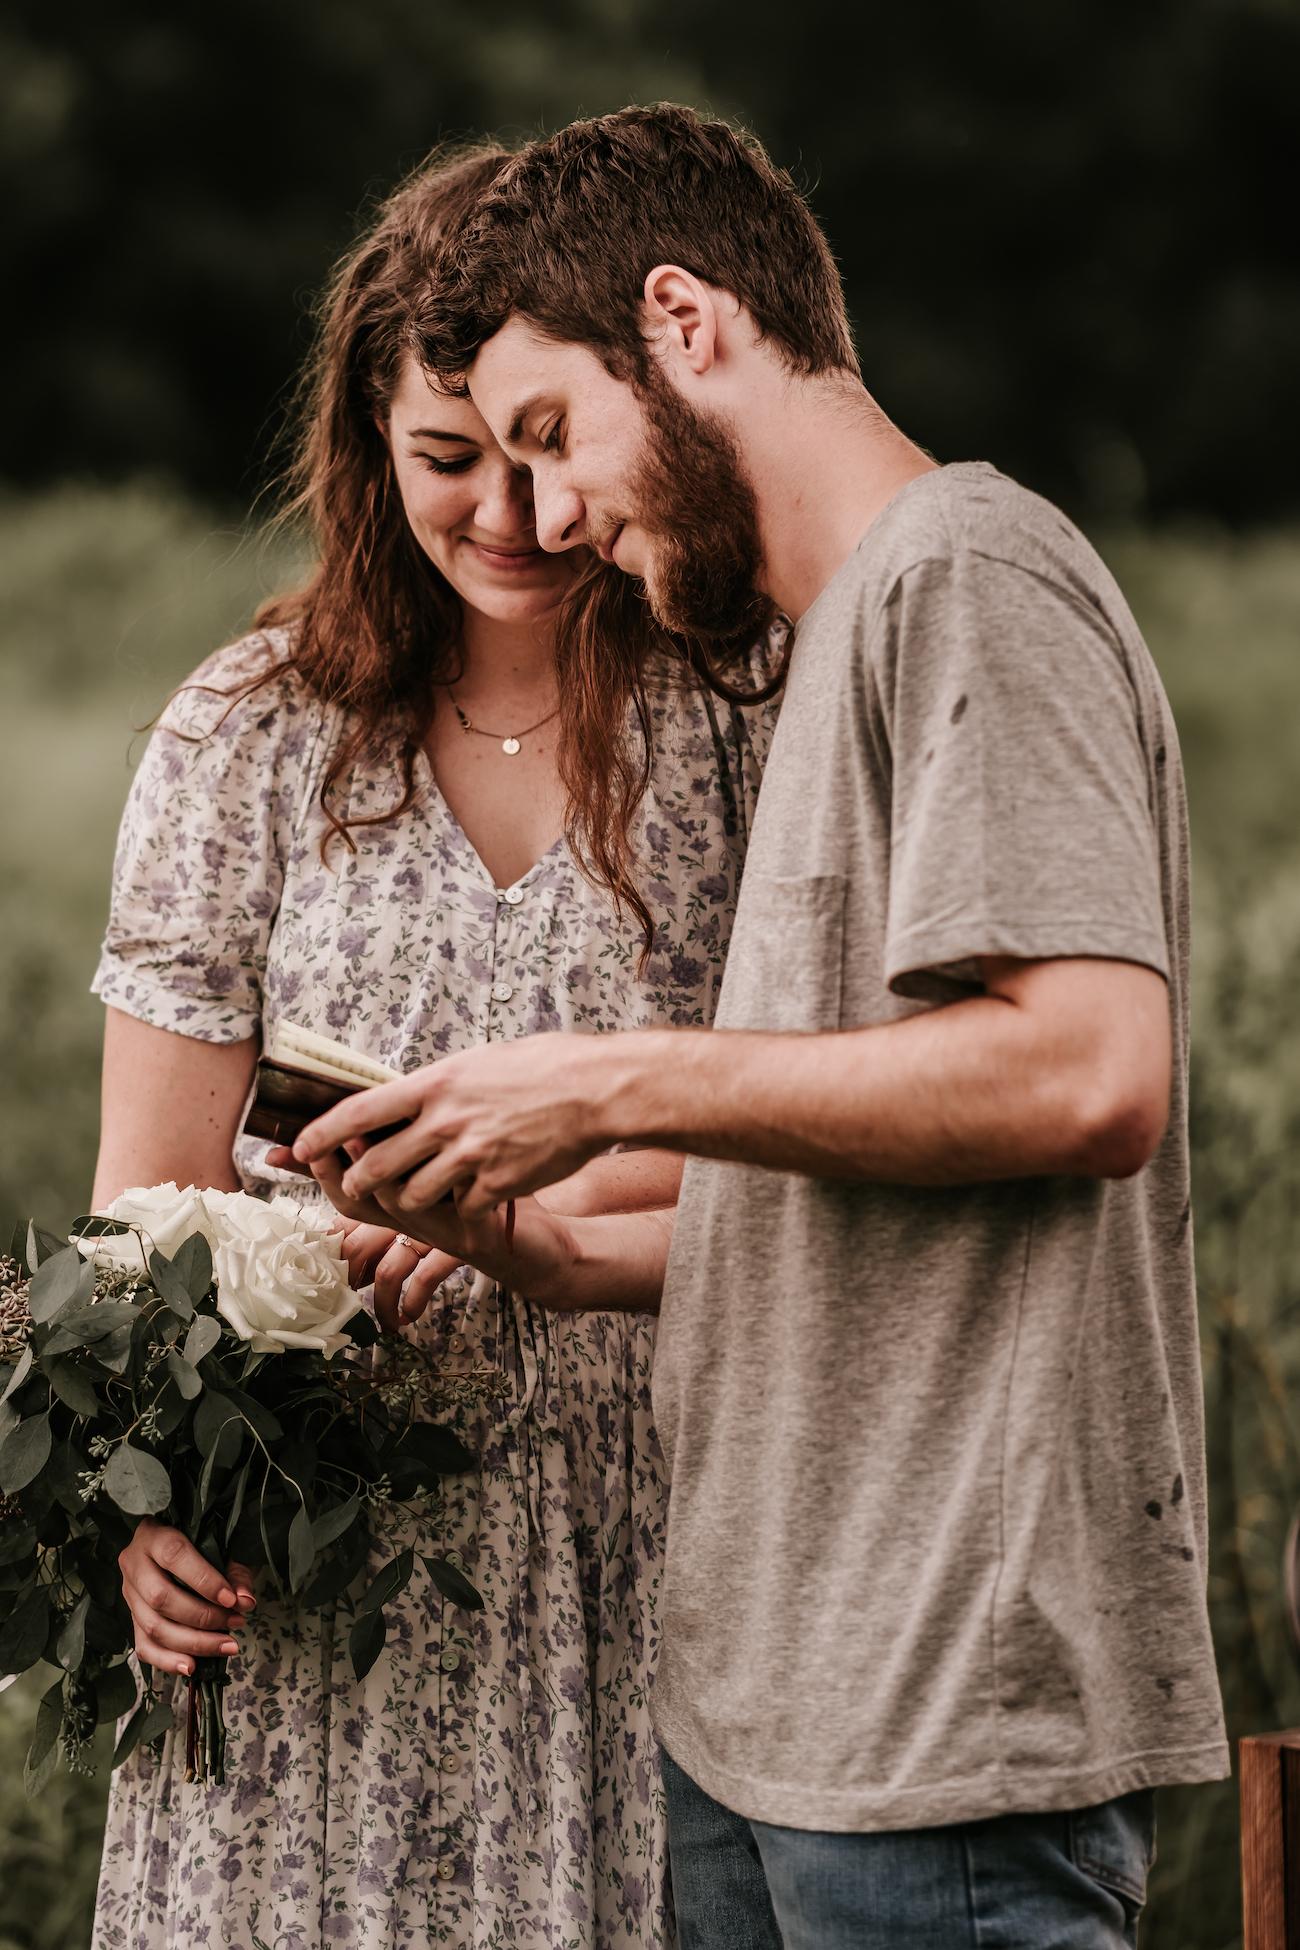 tampa-engagement-proposal-photography-97.jpeg